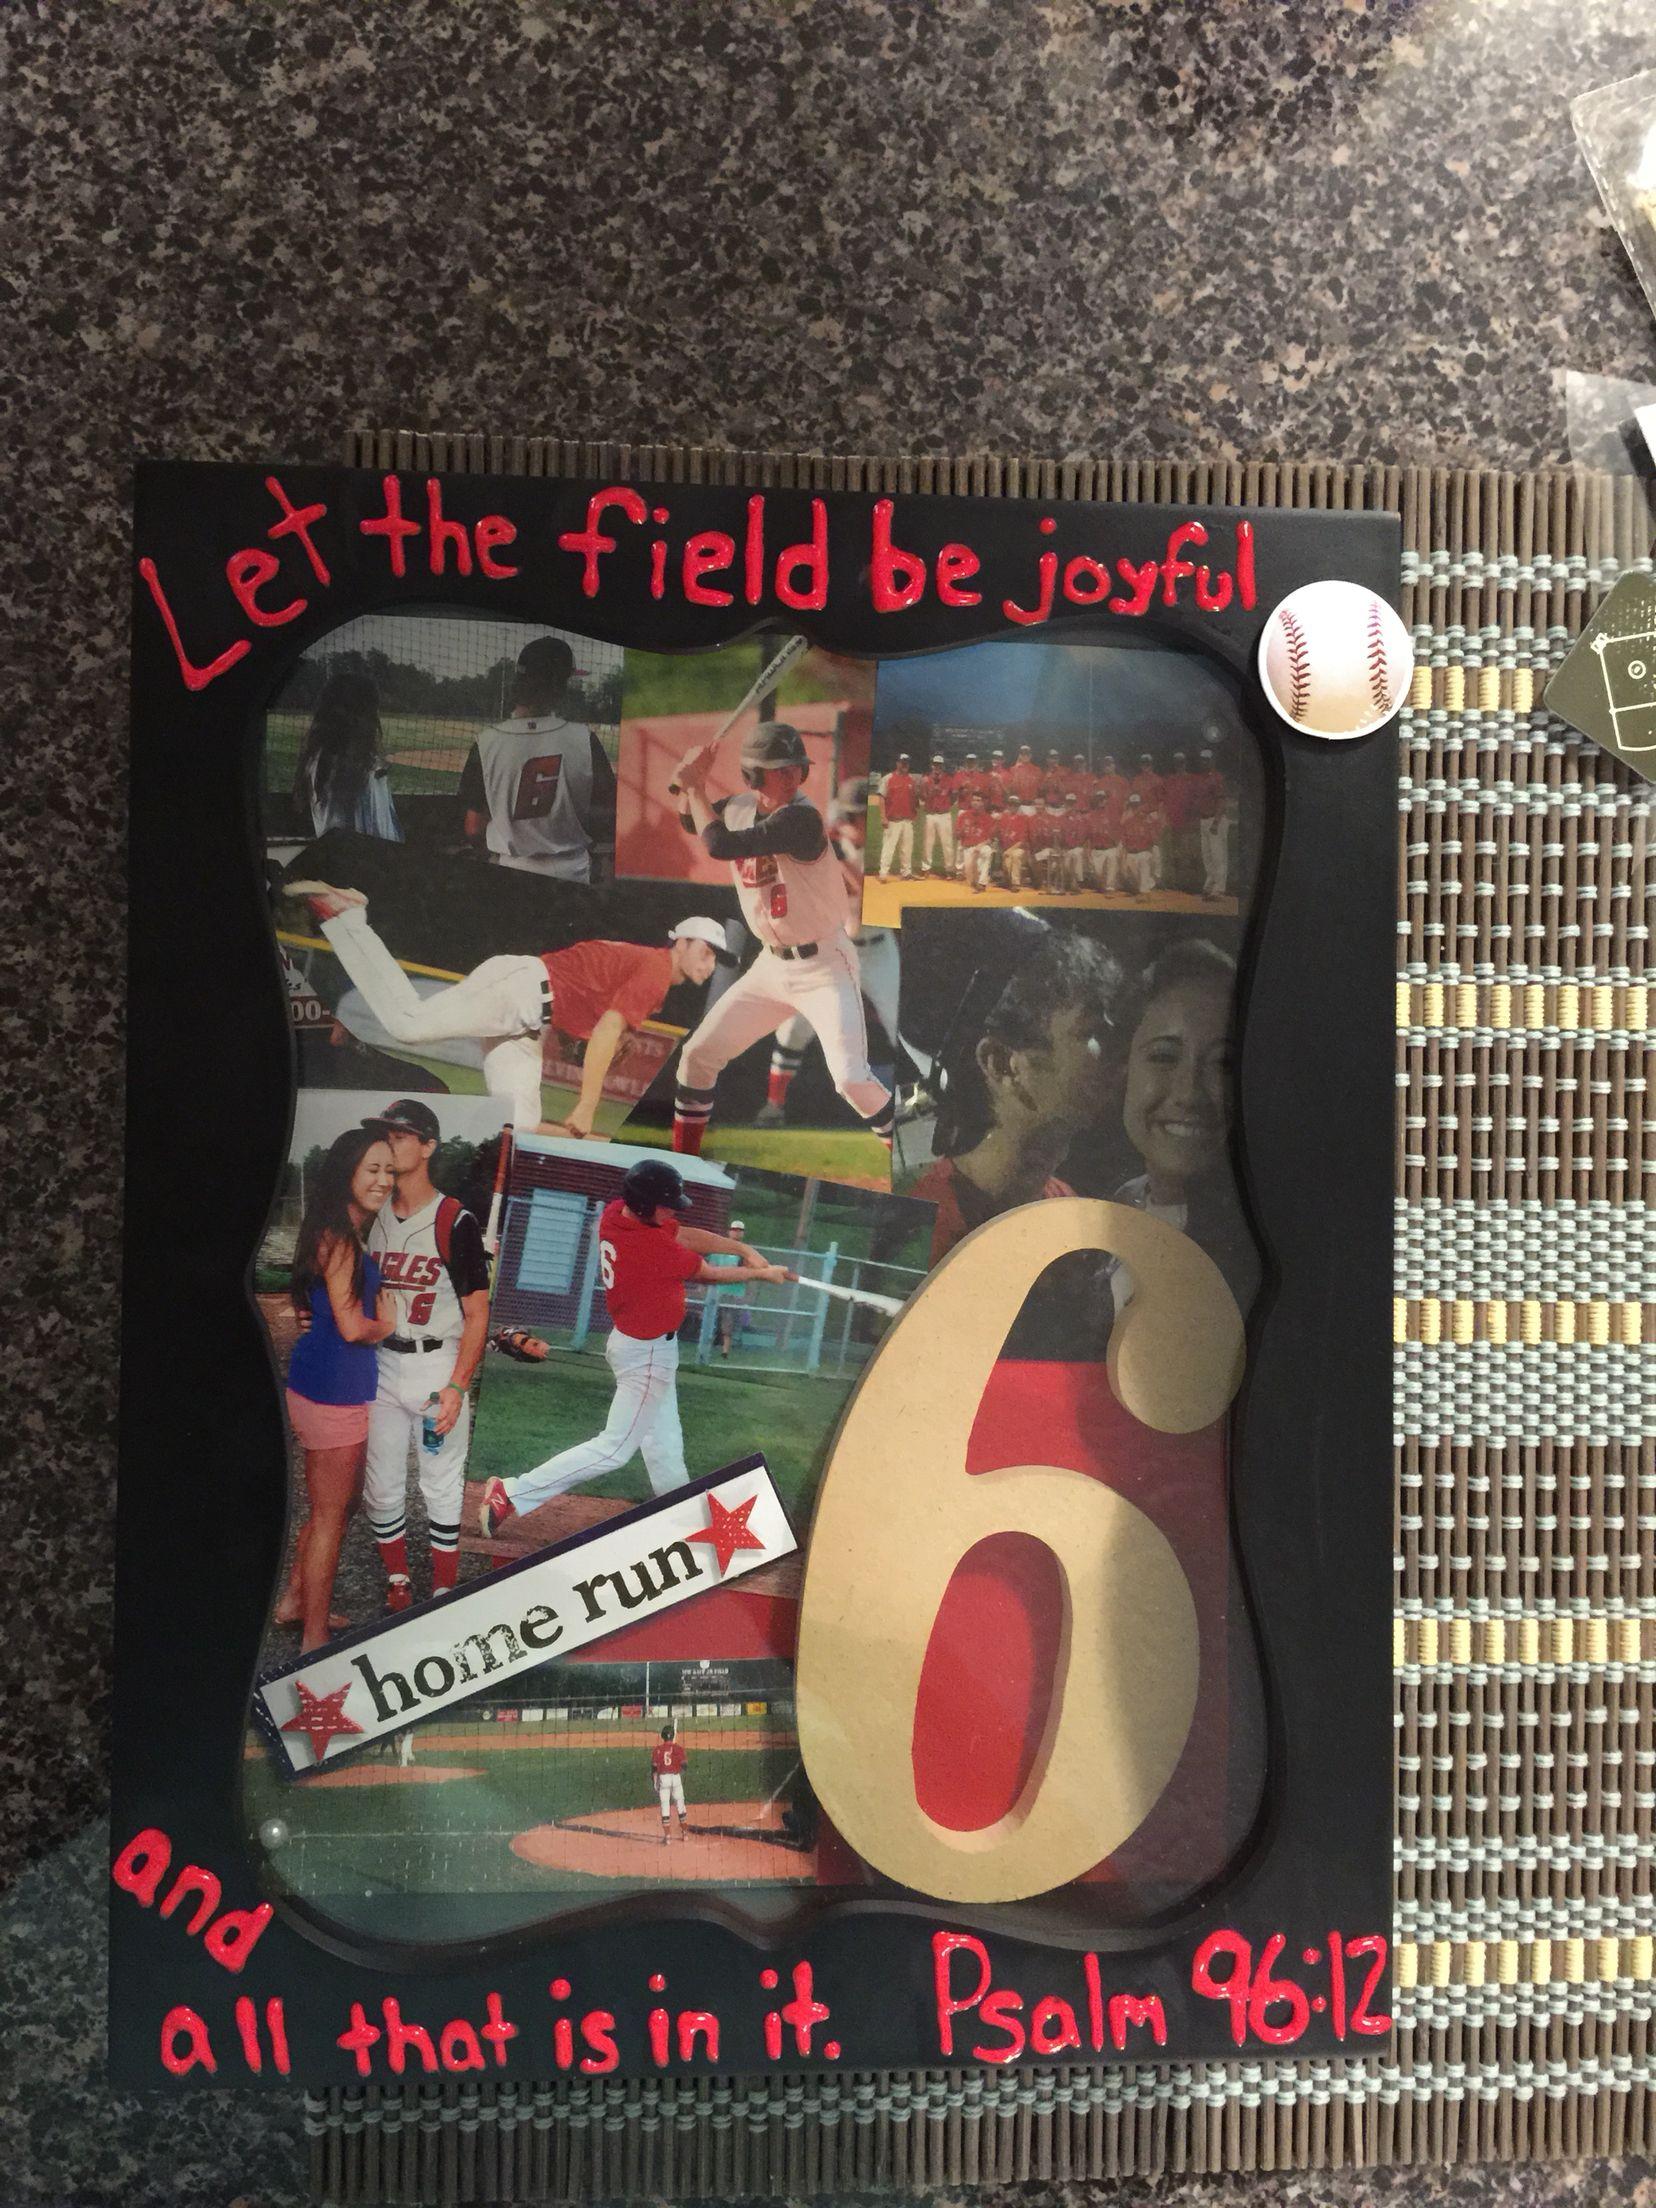 Anniversary Gift For Baseball Boyfriend Baseball Boyfriend Gifts Diy Gifts For Boyfriend Girlfriend Anniversary Gifts